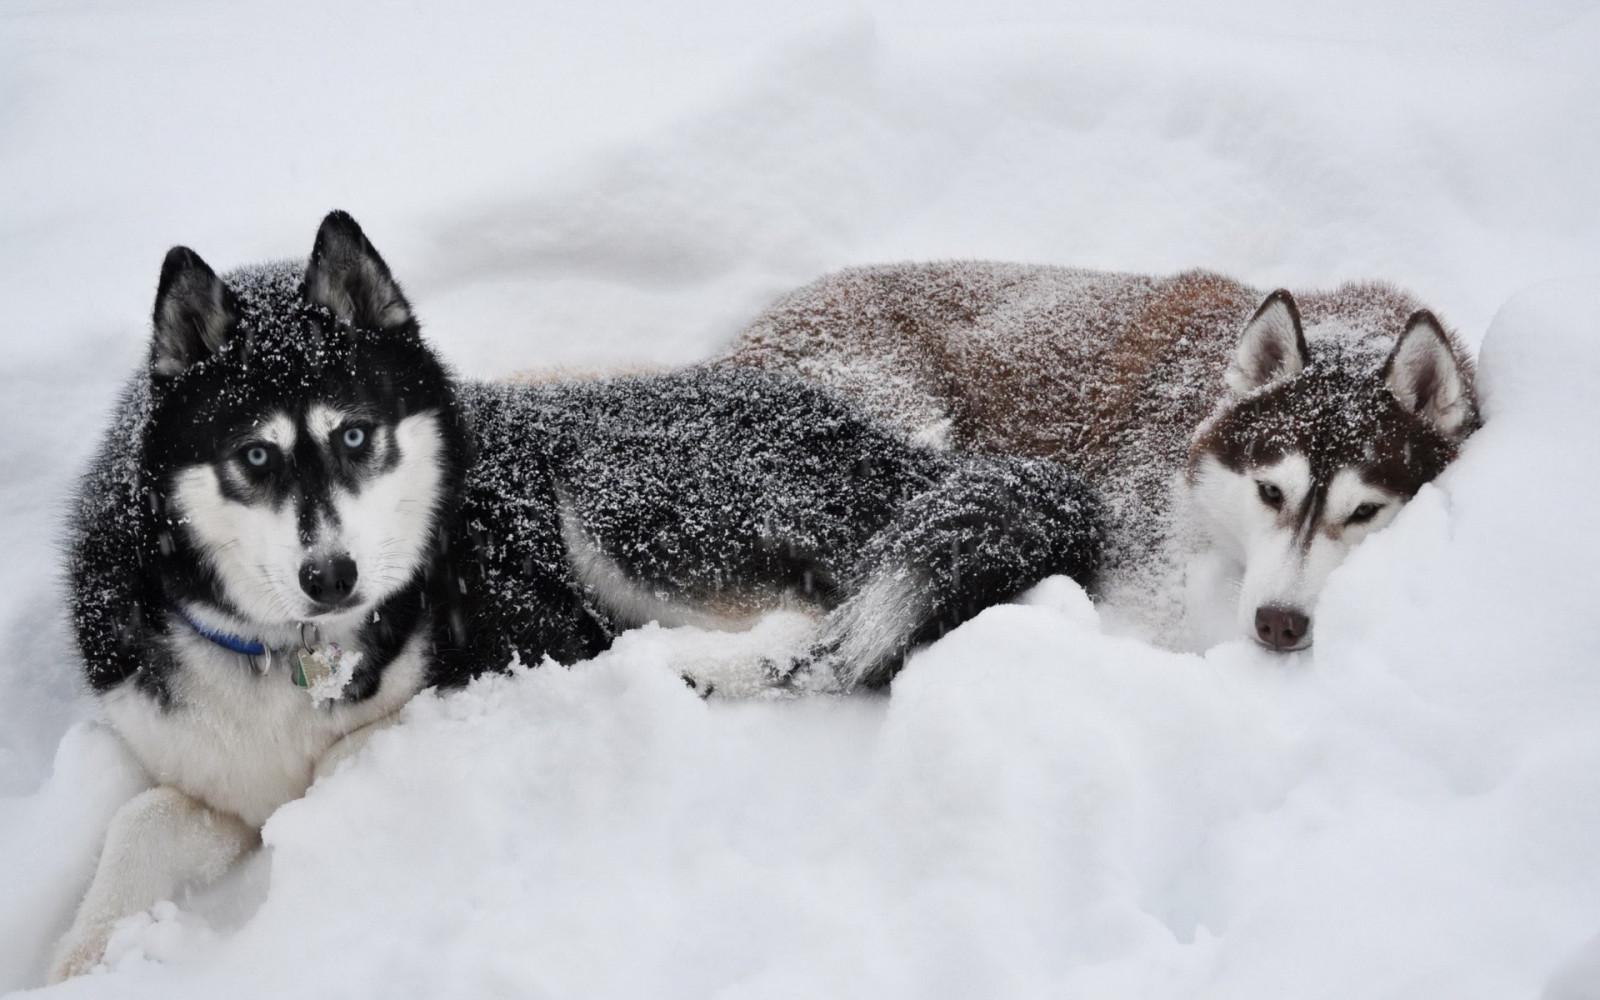 Husky Dog Hd Wallpapers Wallpaper Snow Winter Vehicle Siberian Husky Alaskan